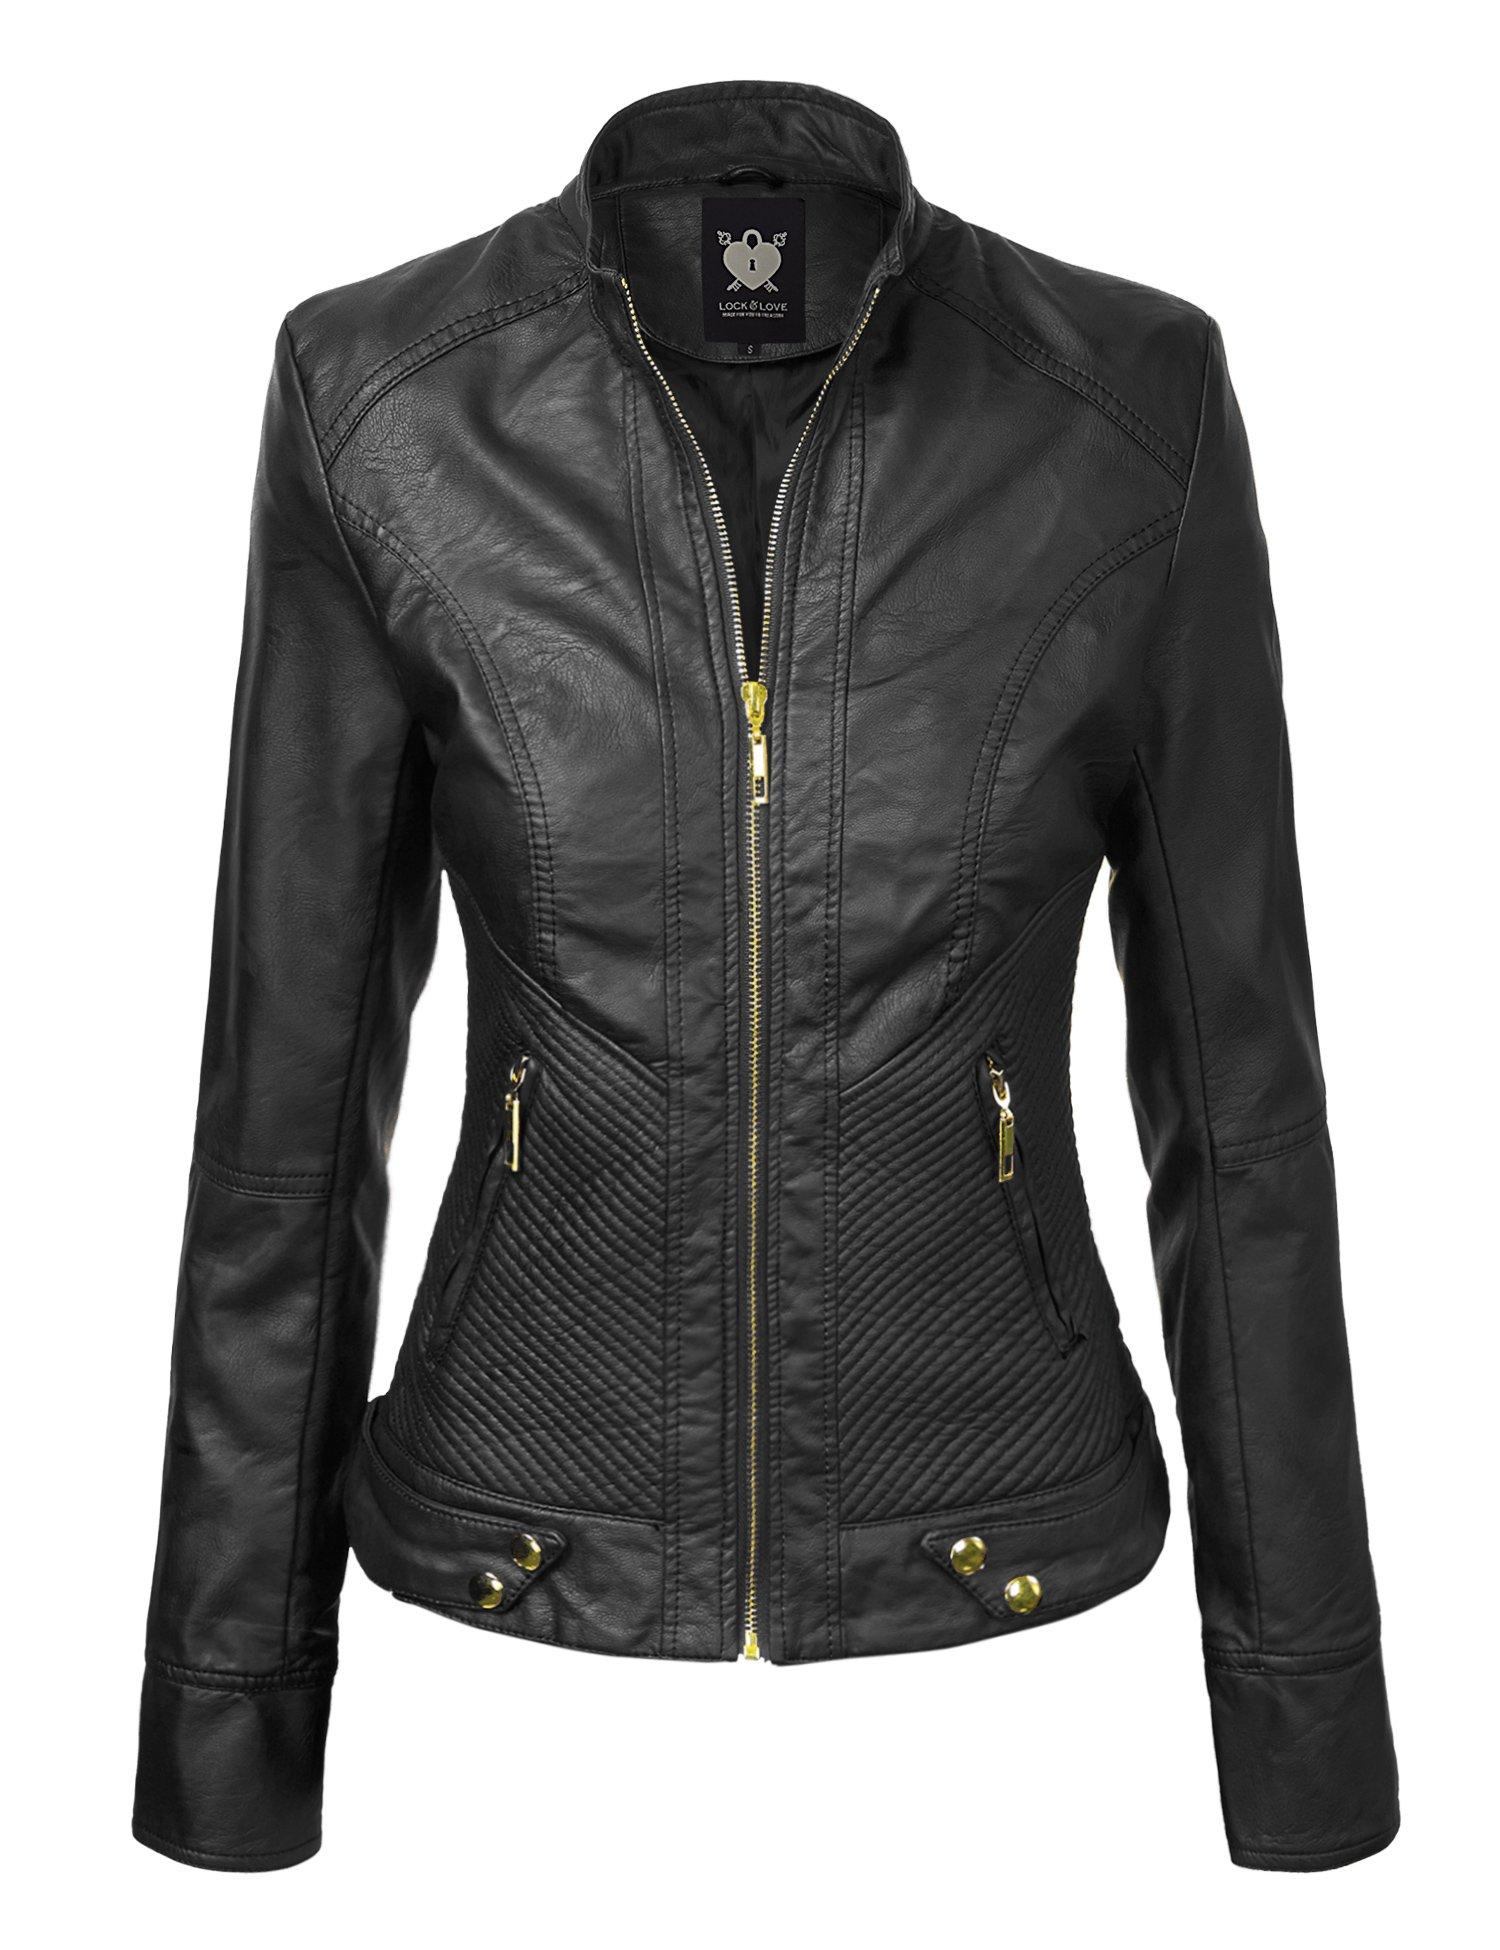 WJC747 Womens Dressy Vegan Leather Biker Jacket M Black